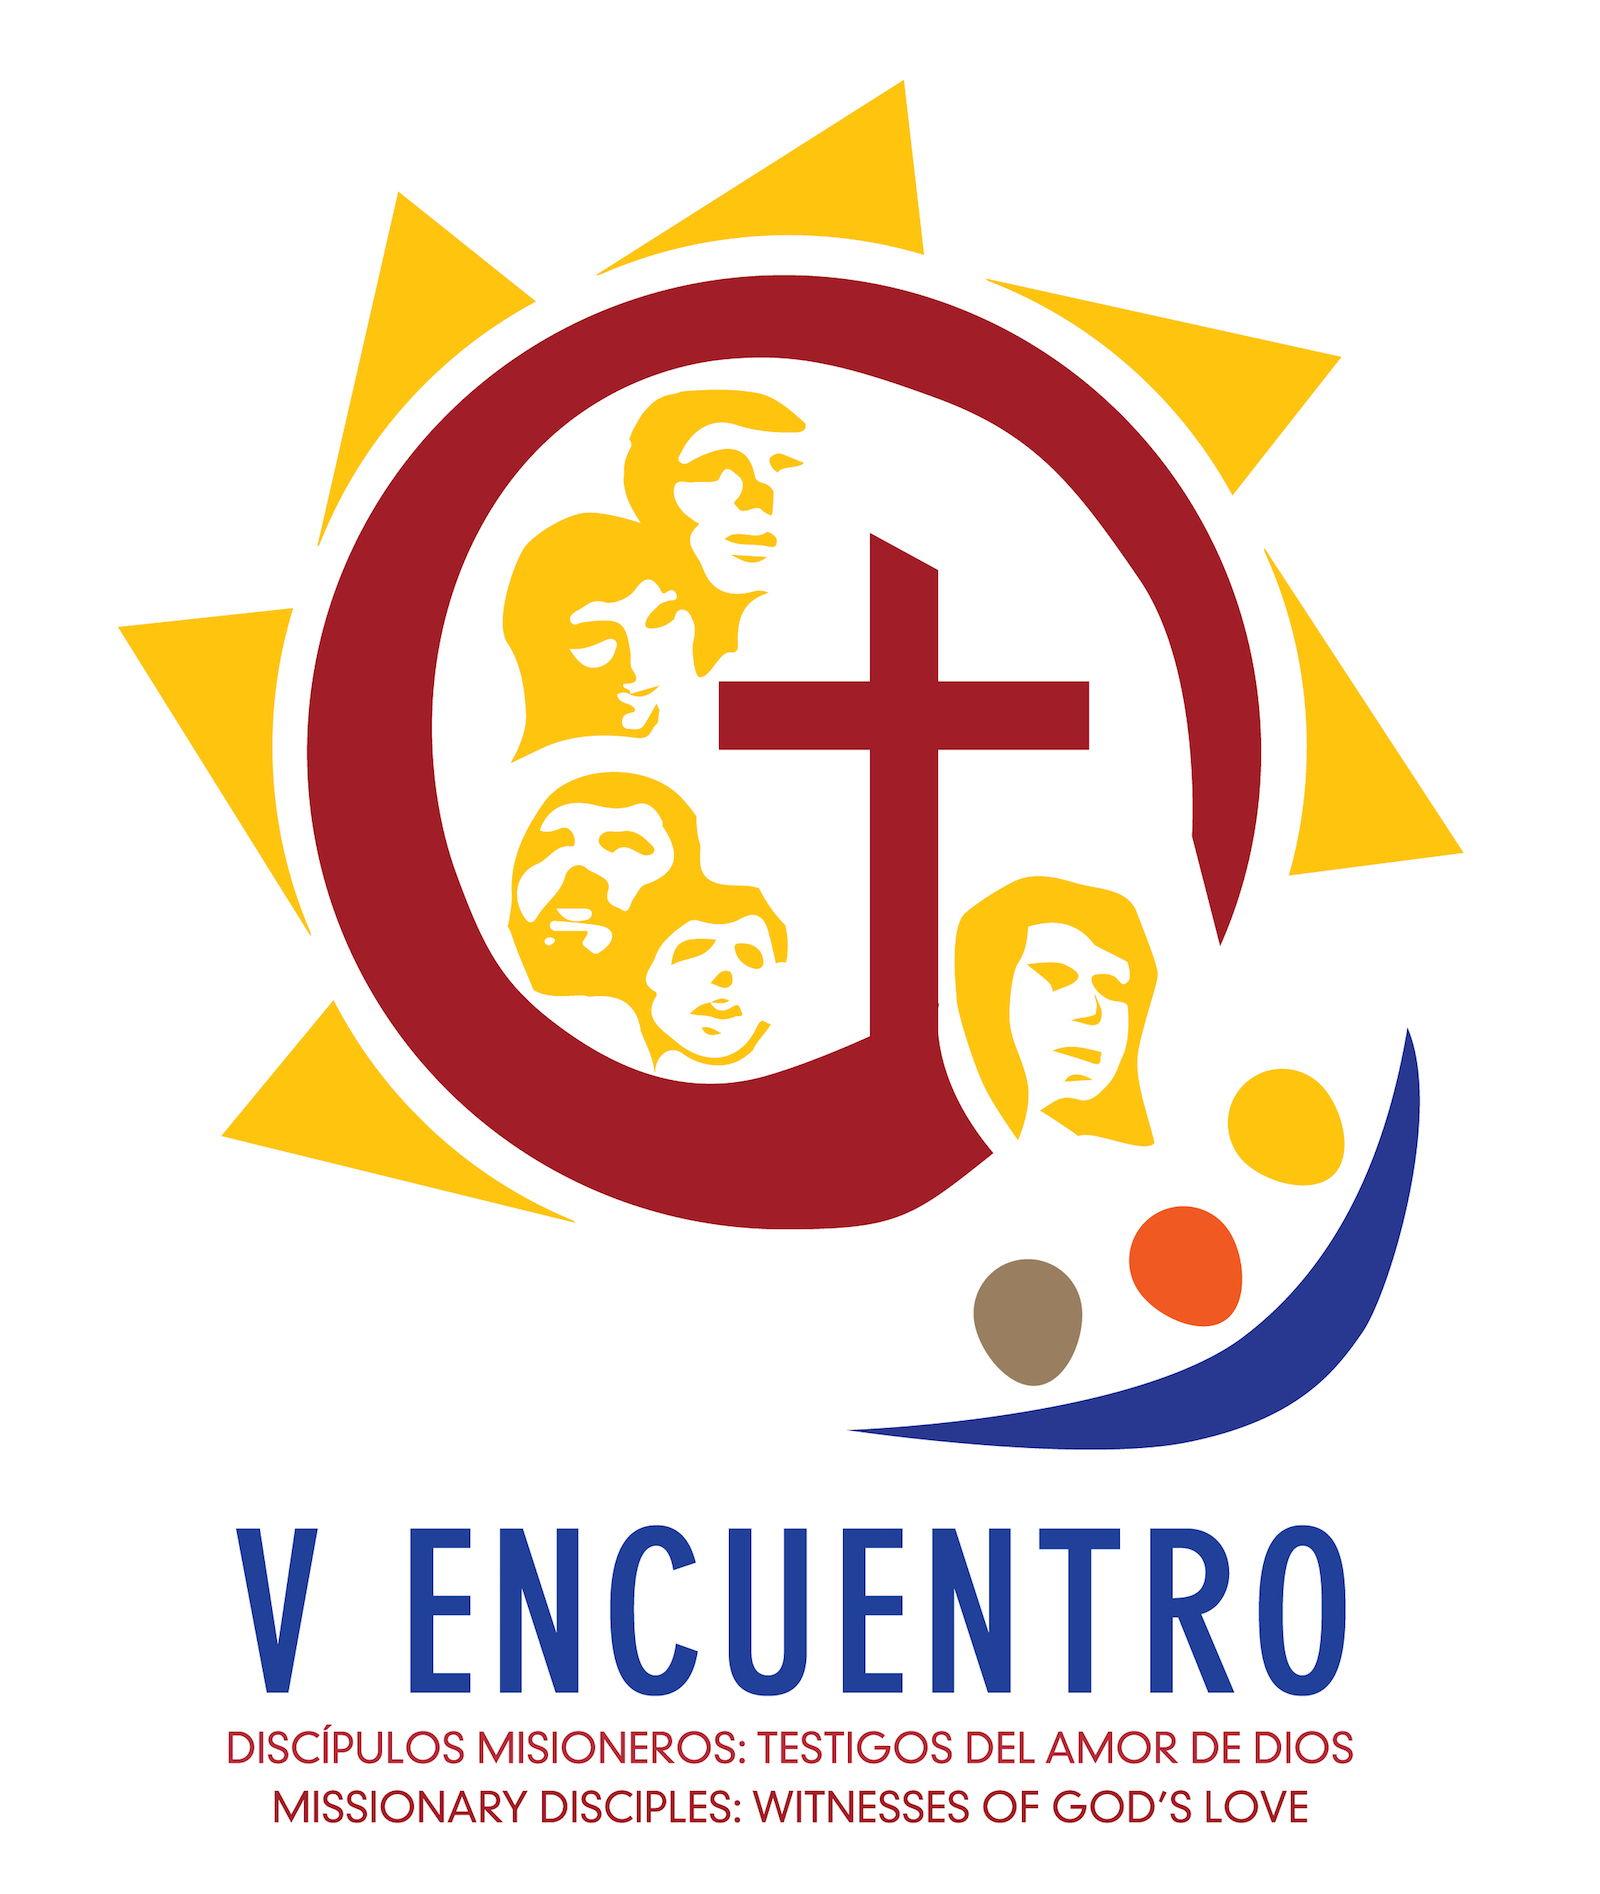 V-EncuentoLogo-bilingual.jpg